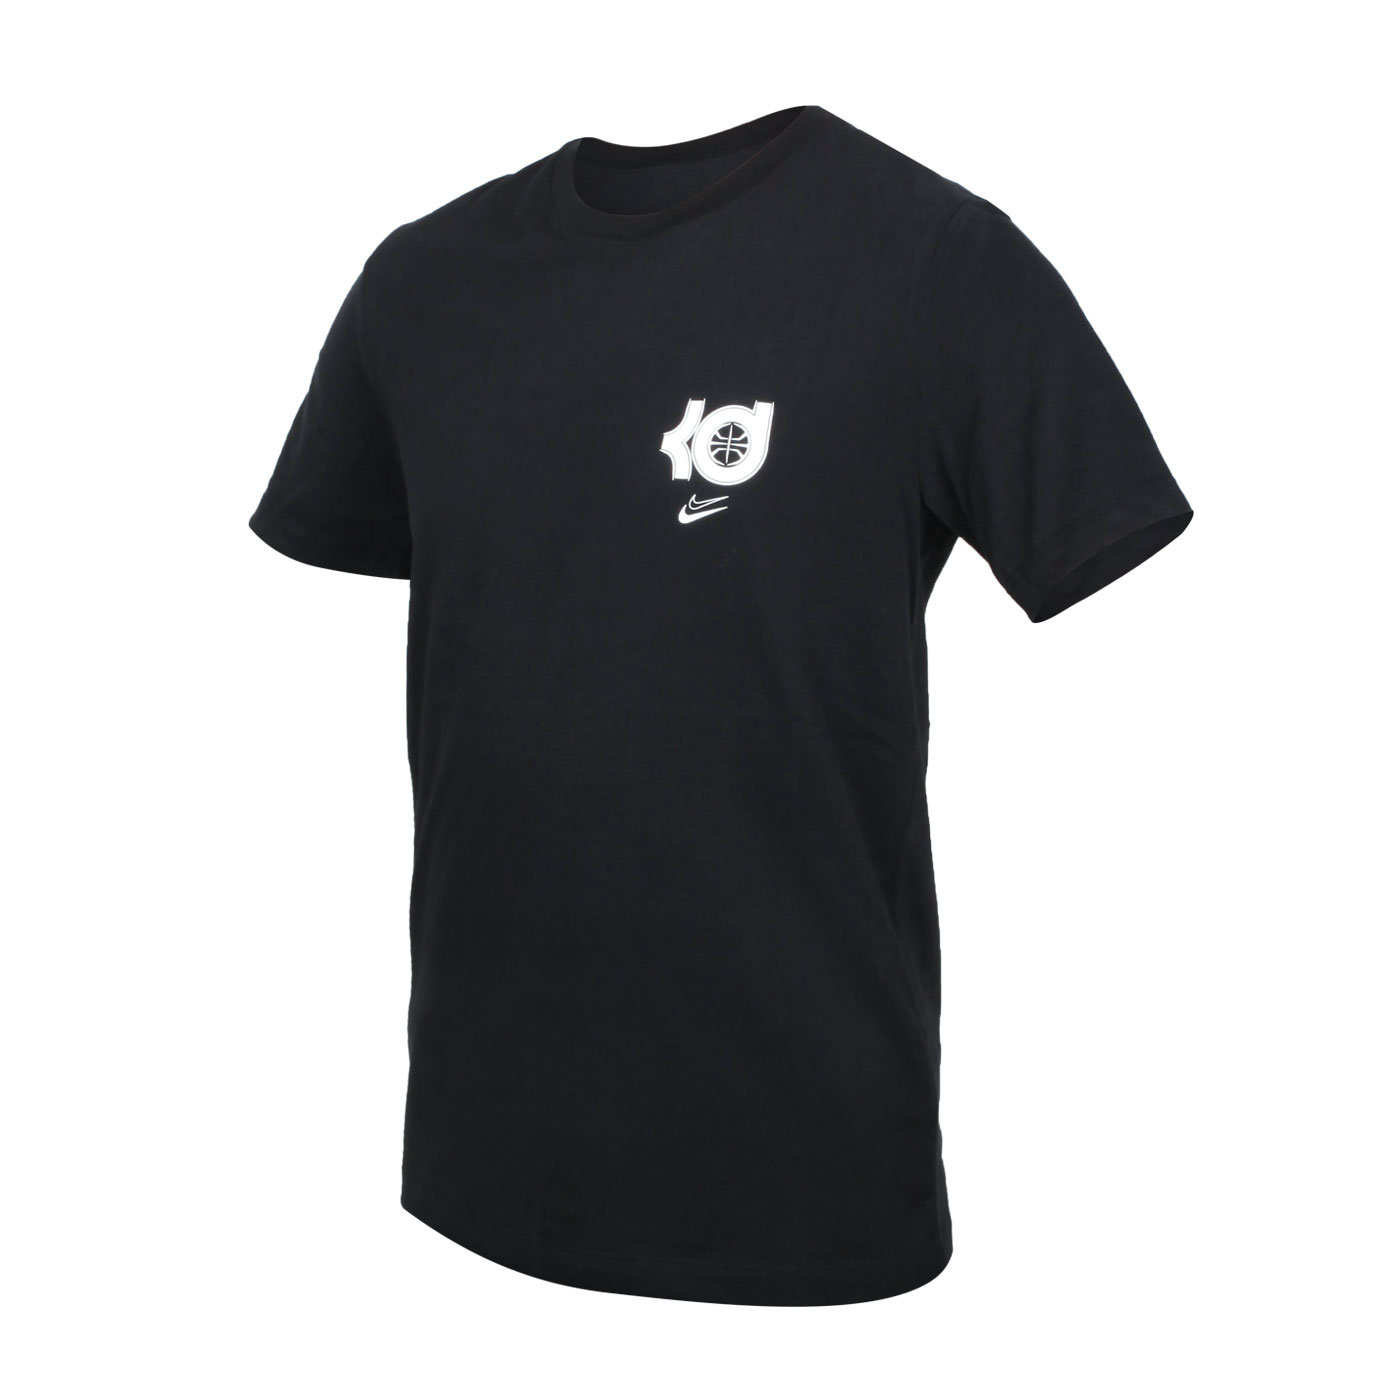 NIKE 男款短袖T恤 DD0776-010 - 黑白